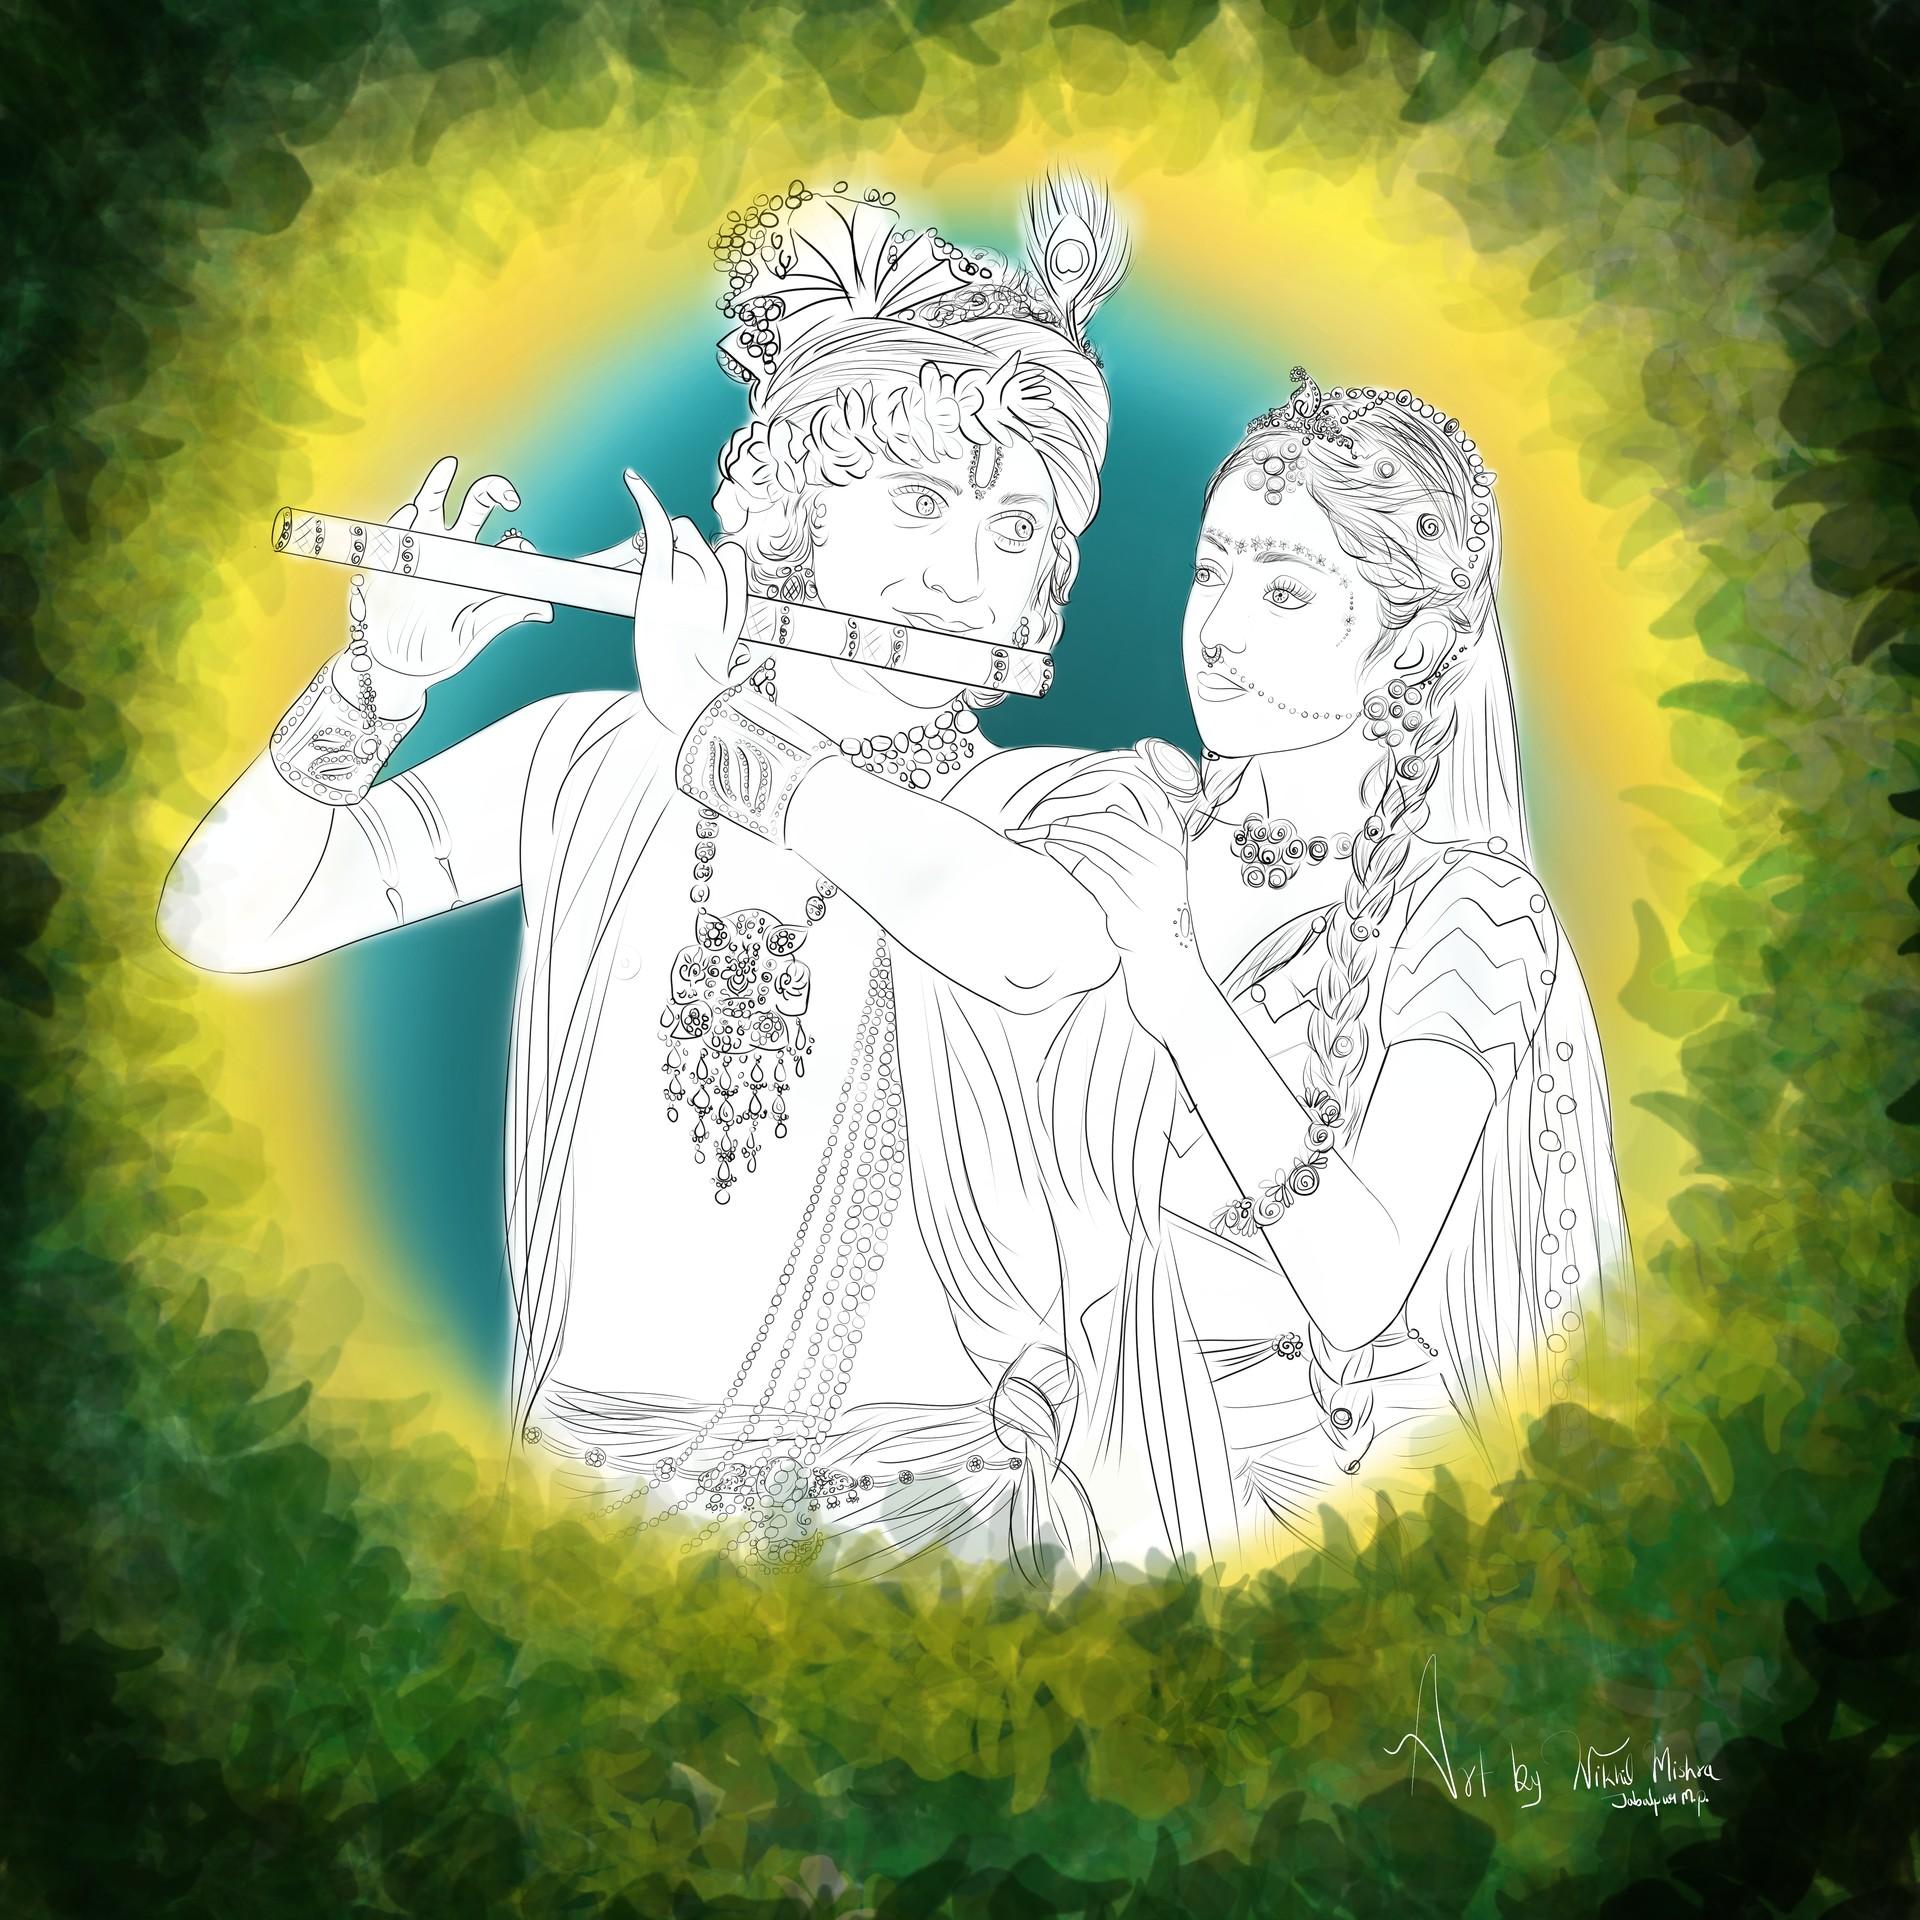 Nikhil Mishra - line art of Radhakrishna, Radhakrishnan serial on